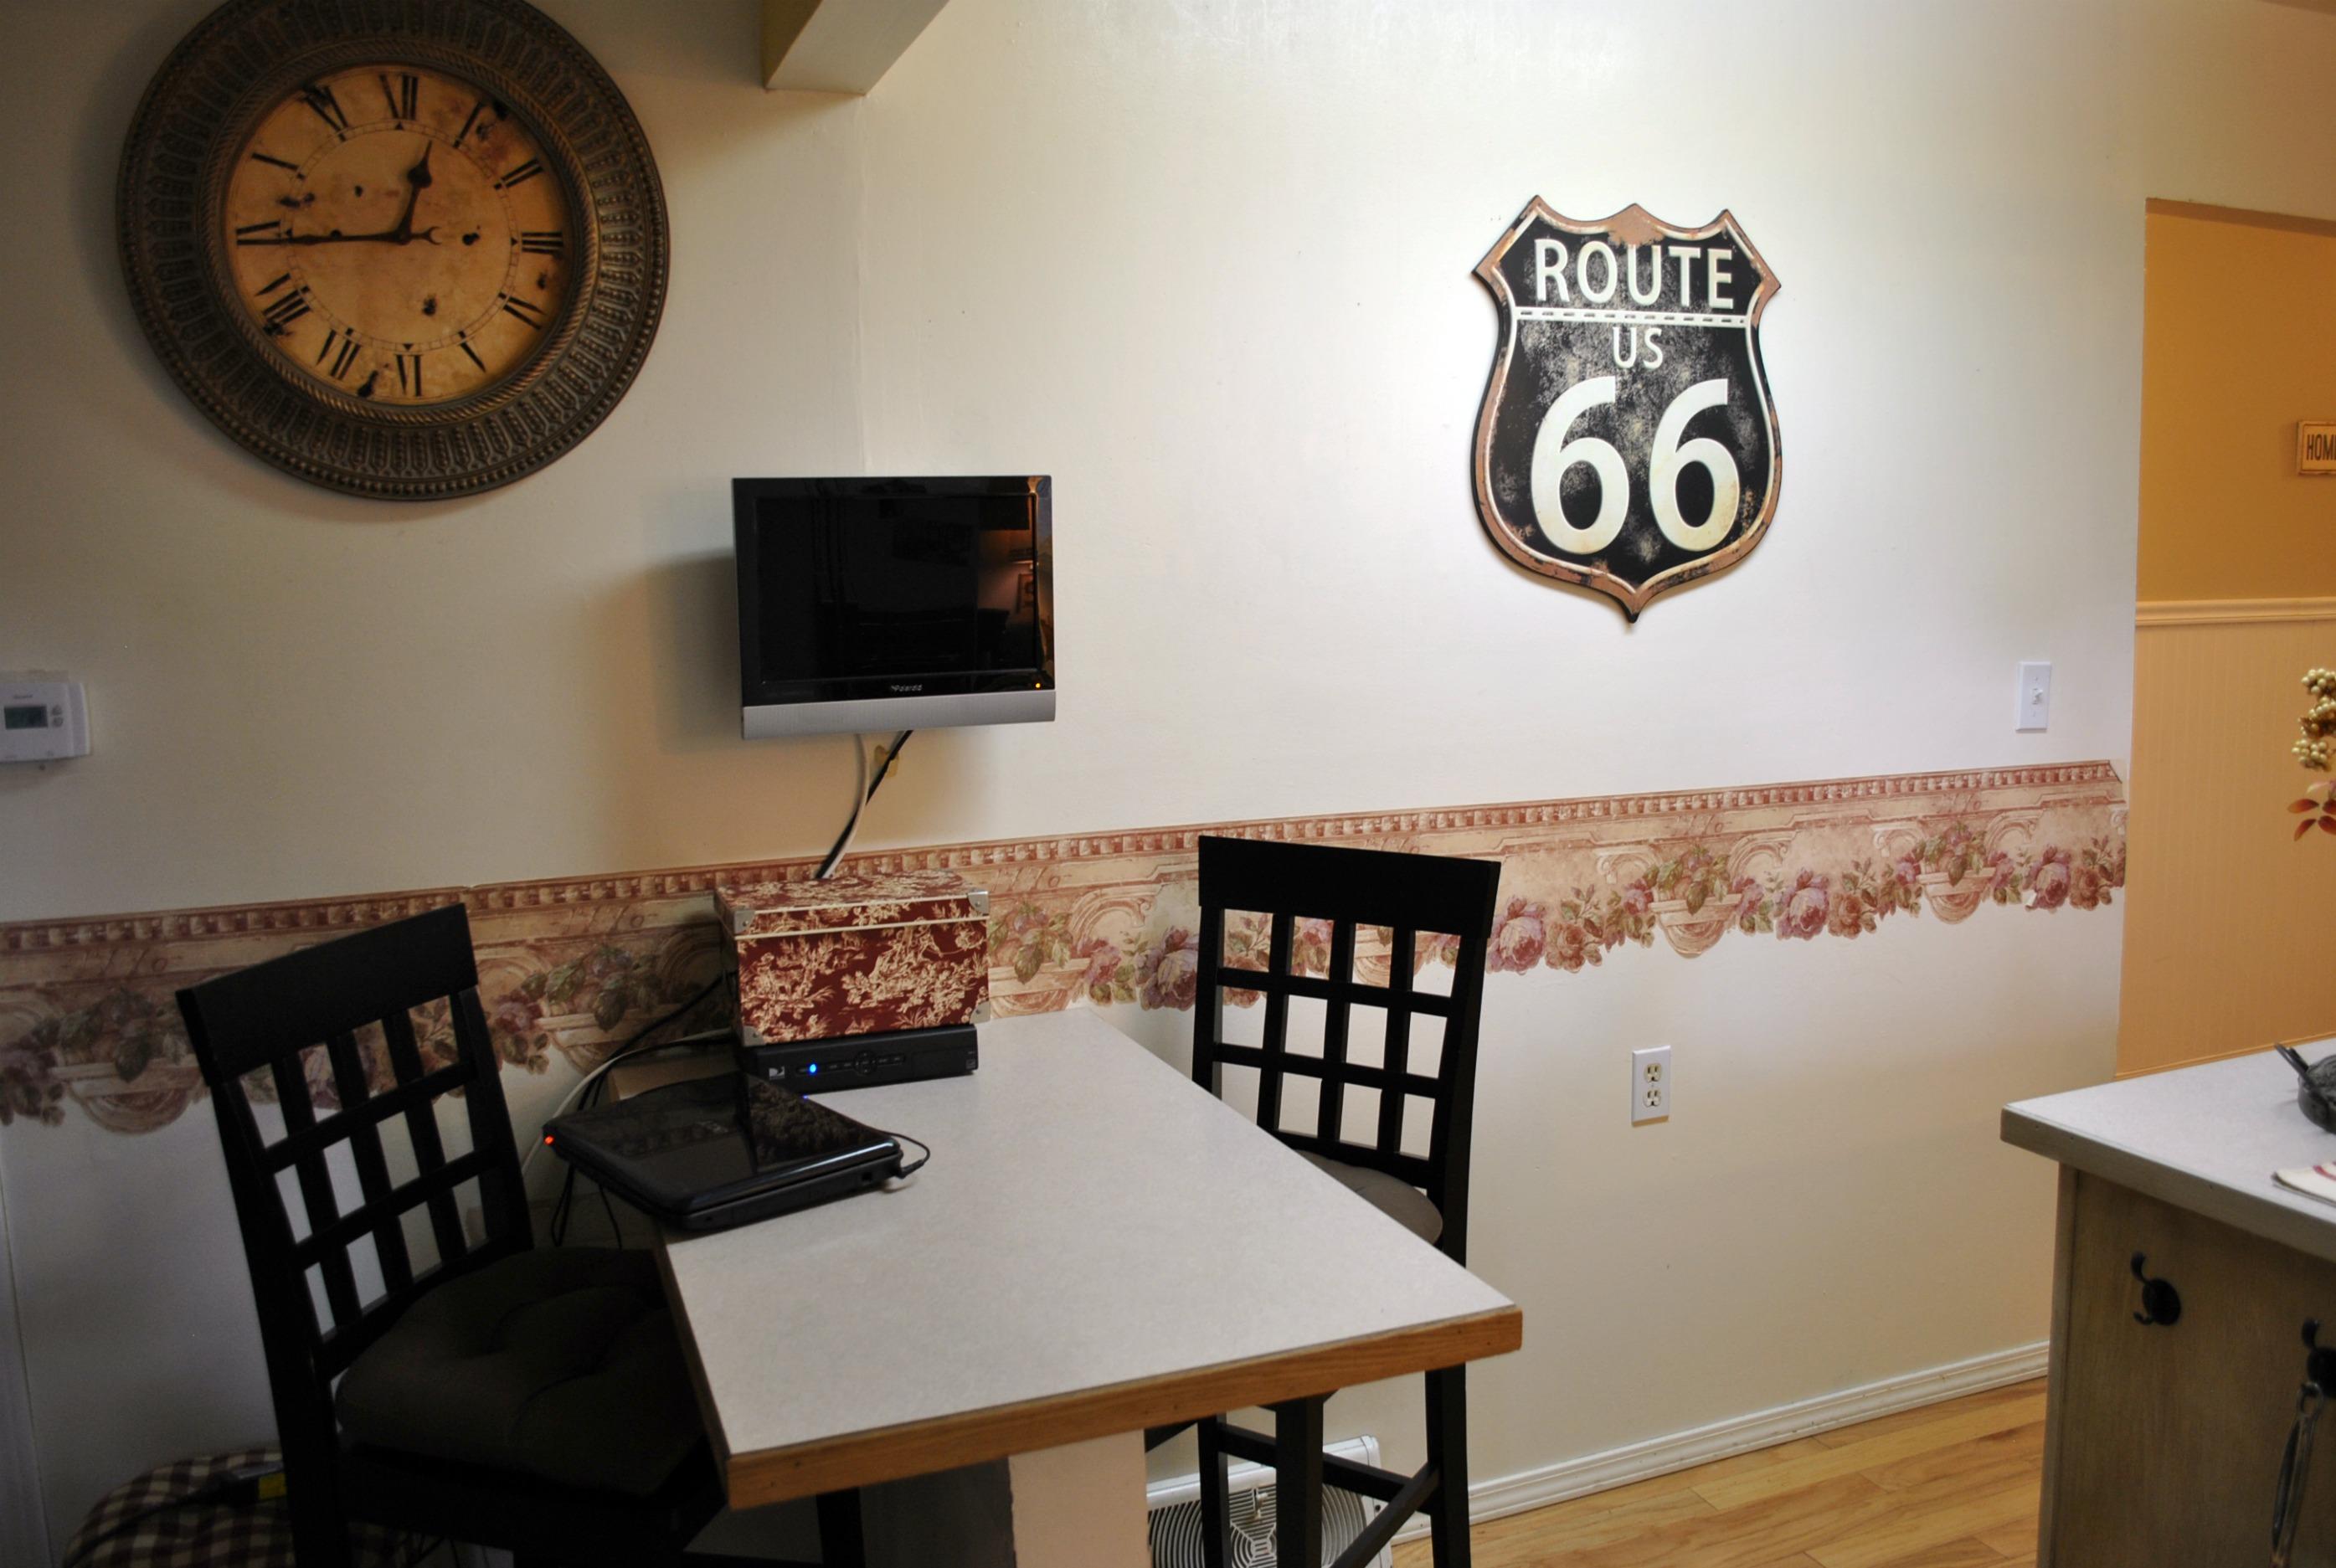 Kitchen Wallpaper Borders Ideas 3 Renovation Ideas EnhancedHomes Org